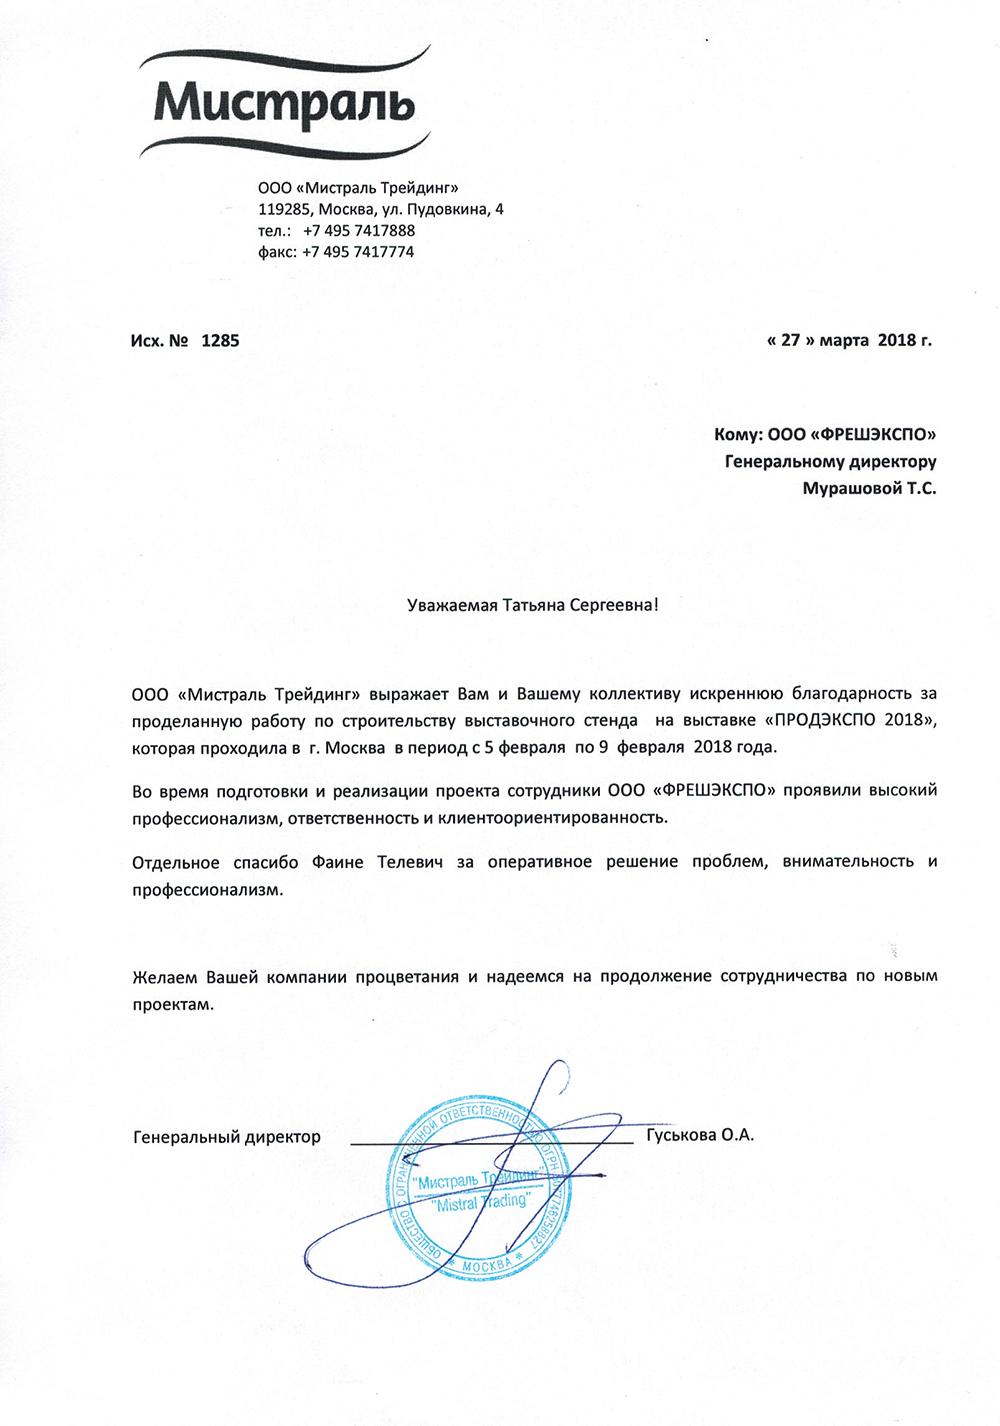 Suppliers from Moldova, Republic of   Moldovan Manufacturers — Panjiva